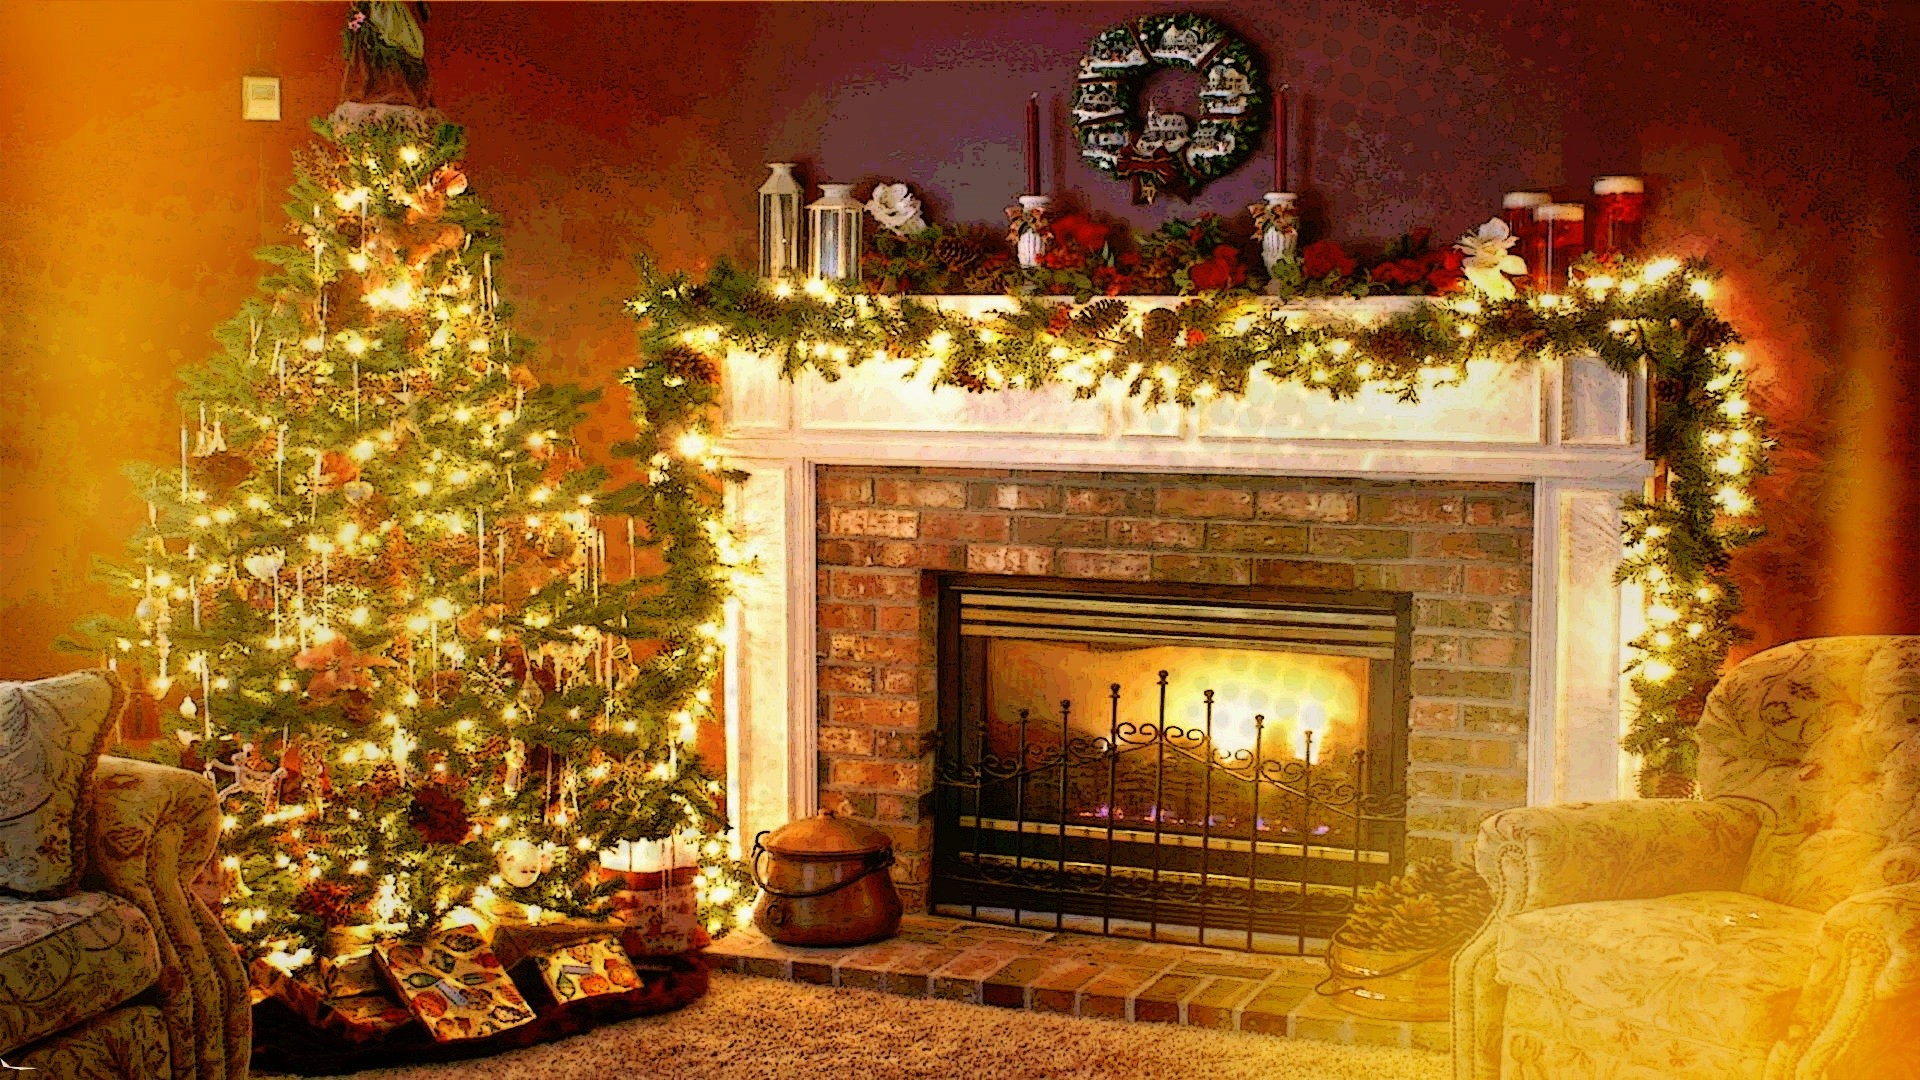 4K Fireplaces Wallpapers High Quality | Download Free à Cheminée De Noel